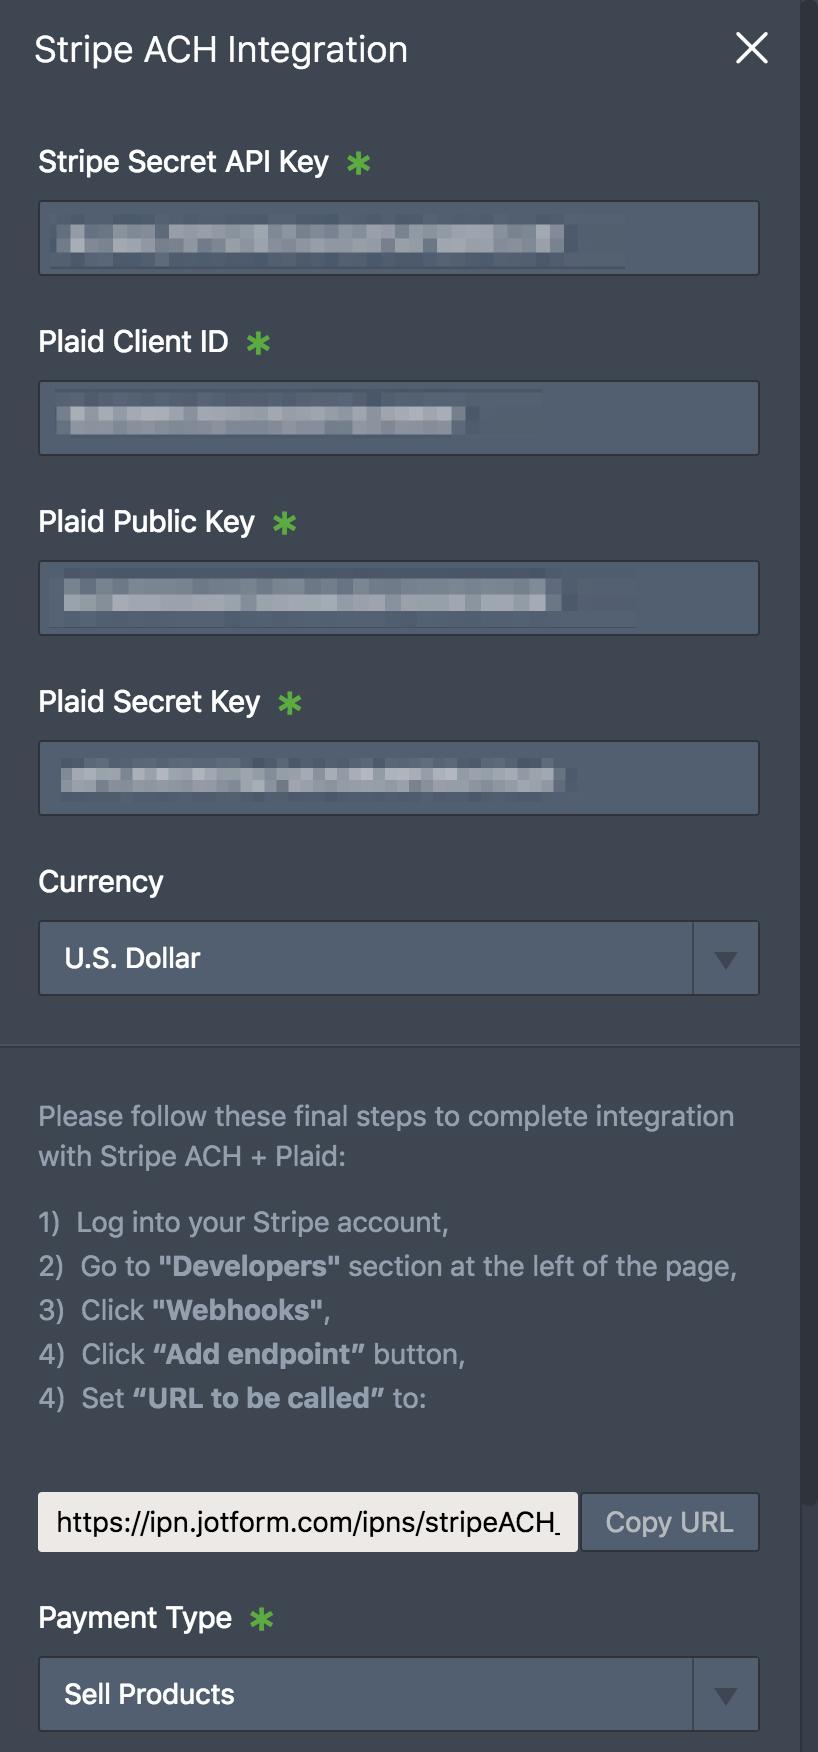 Stripe ACH + Plaid Credentials